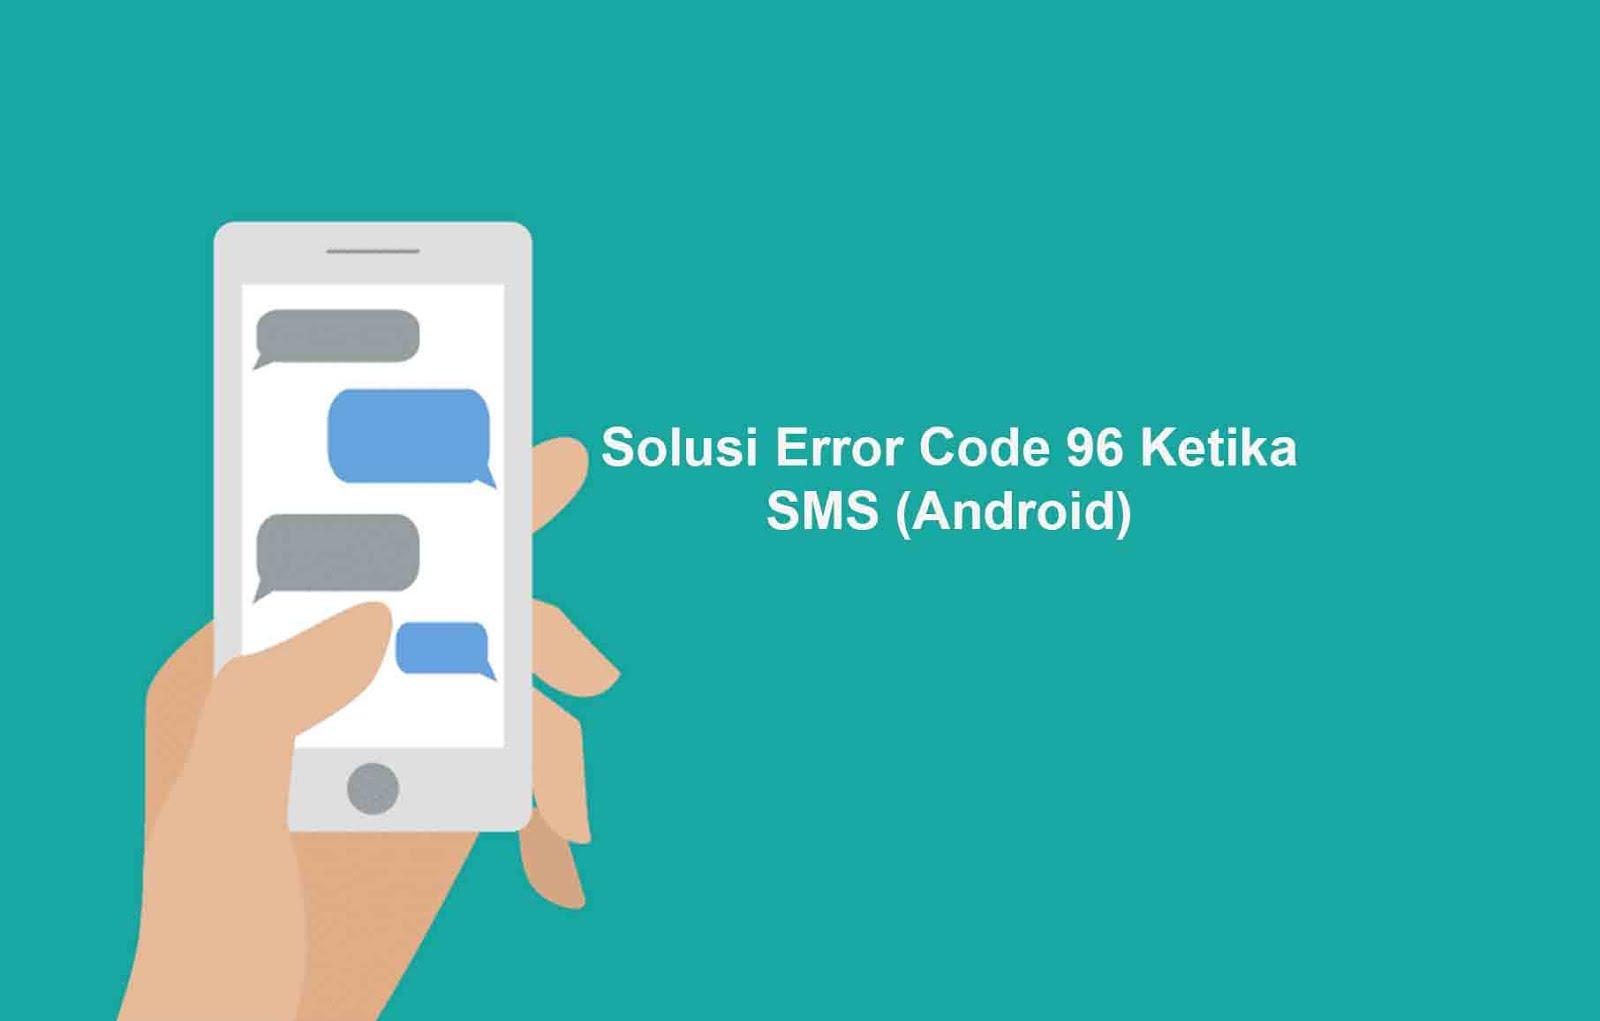 Solusi Error Code 96 Ketika SMS (Android)